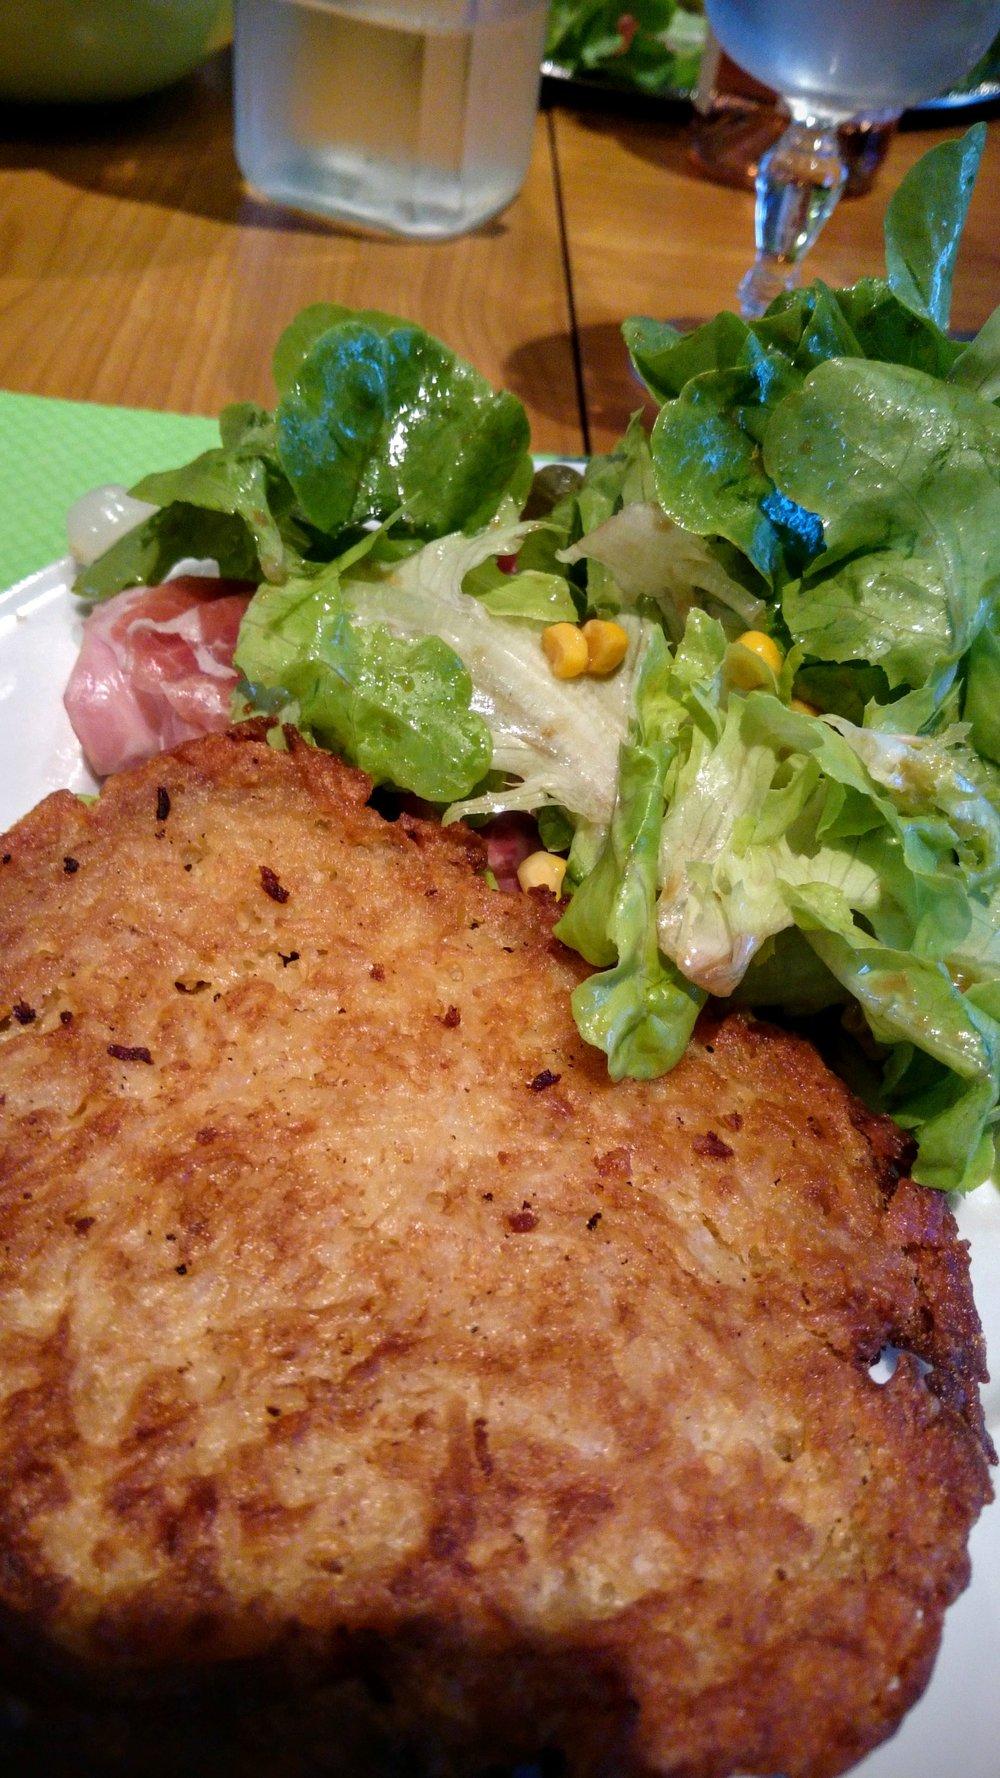 galette-ham-salad.jpg